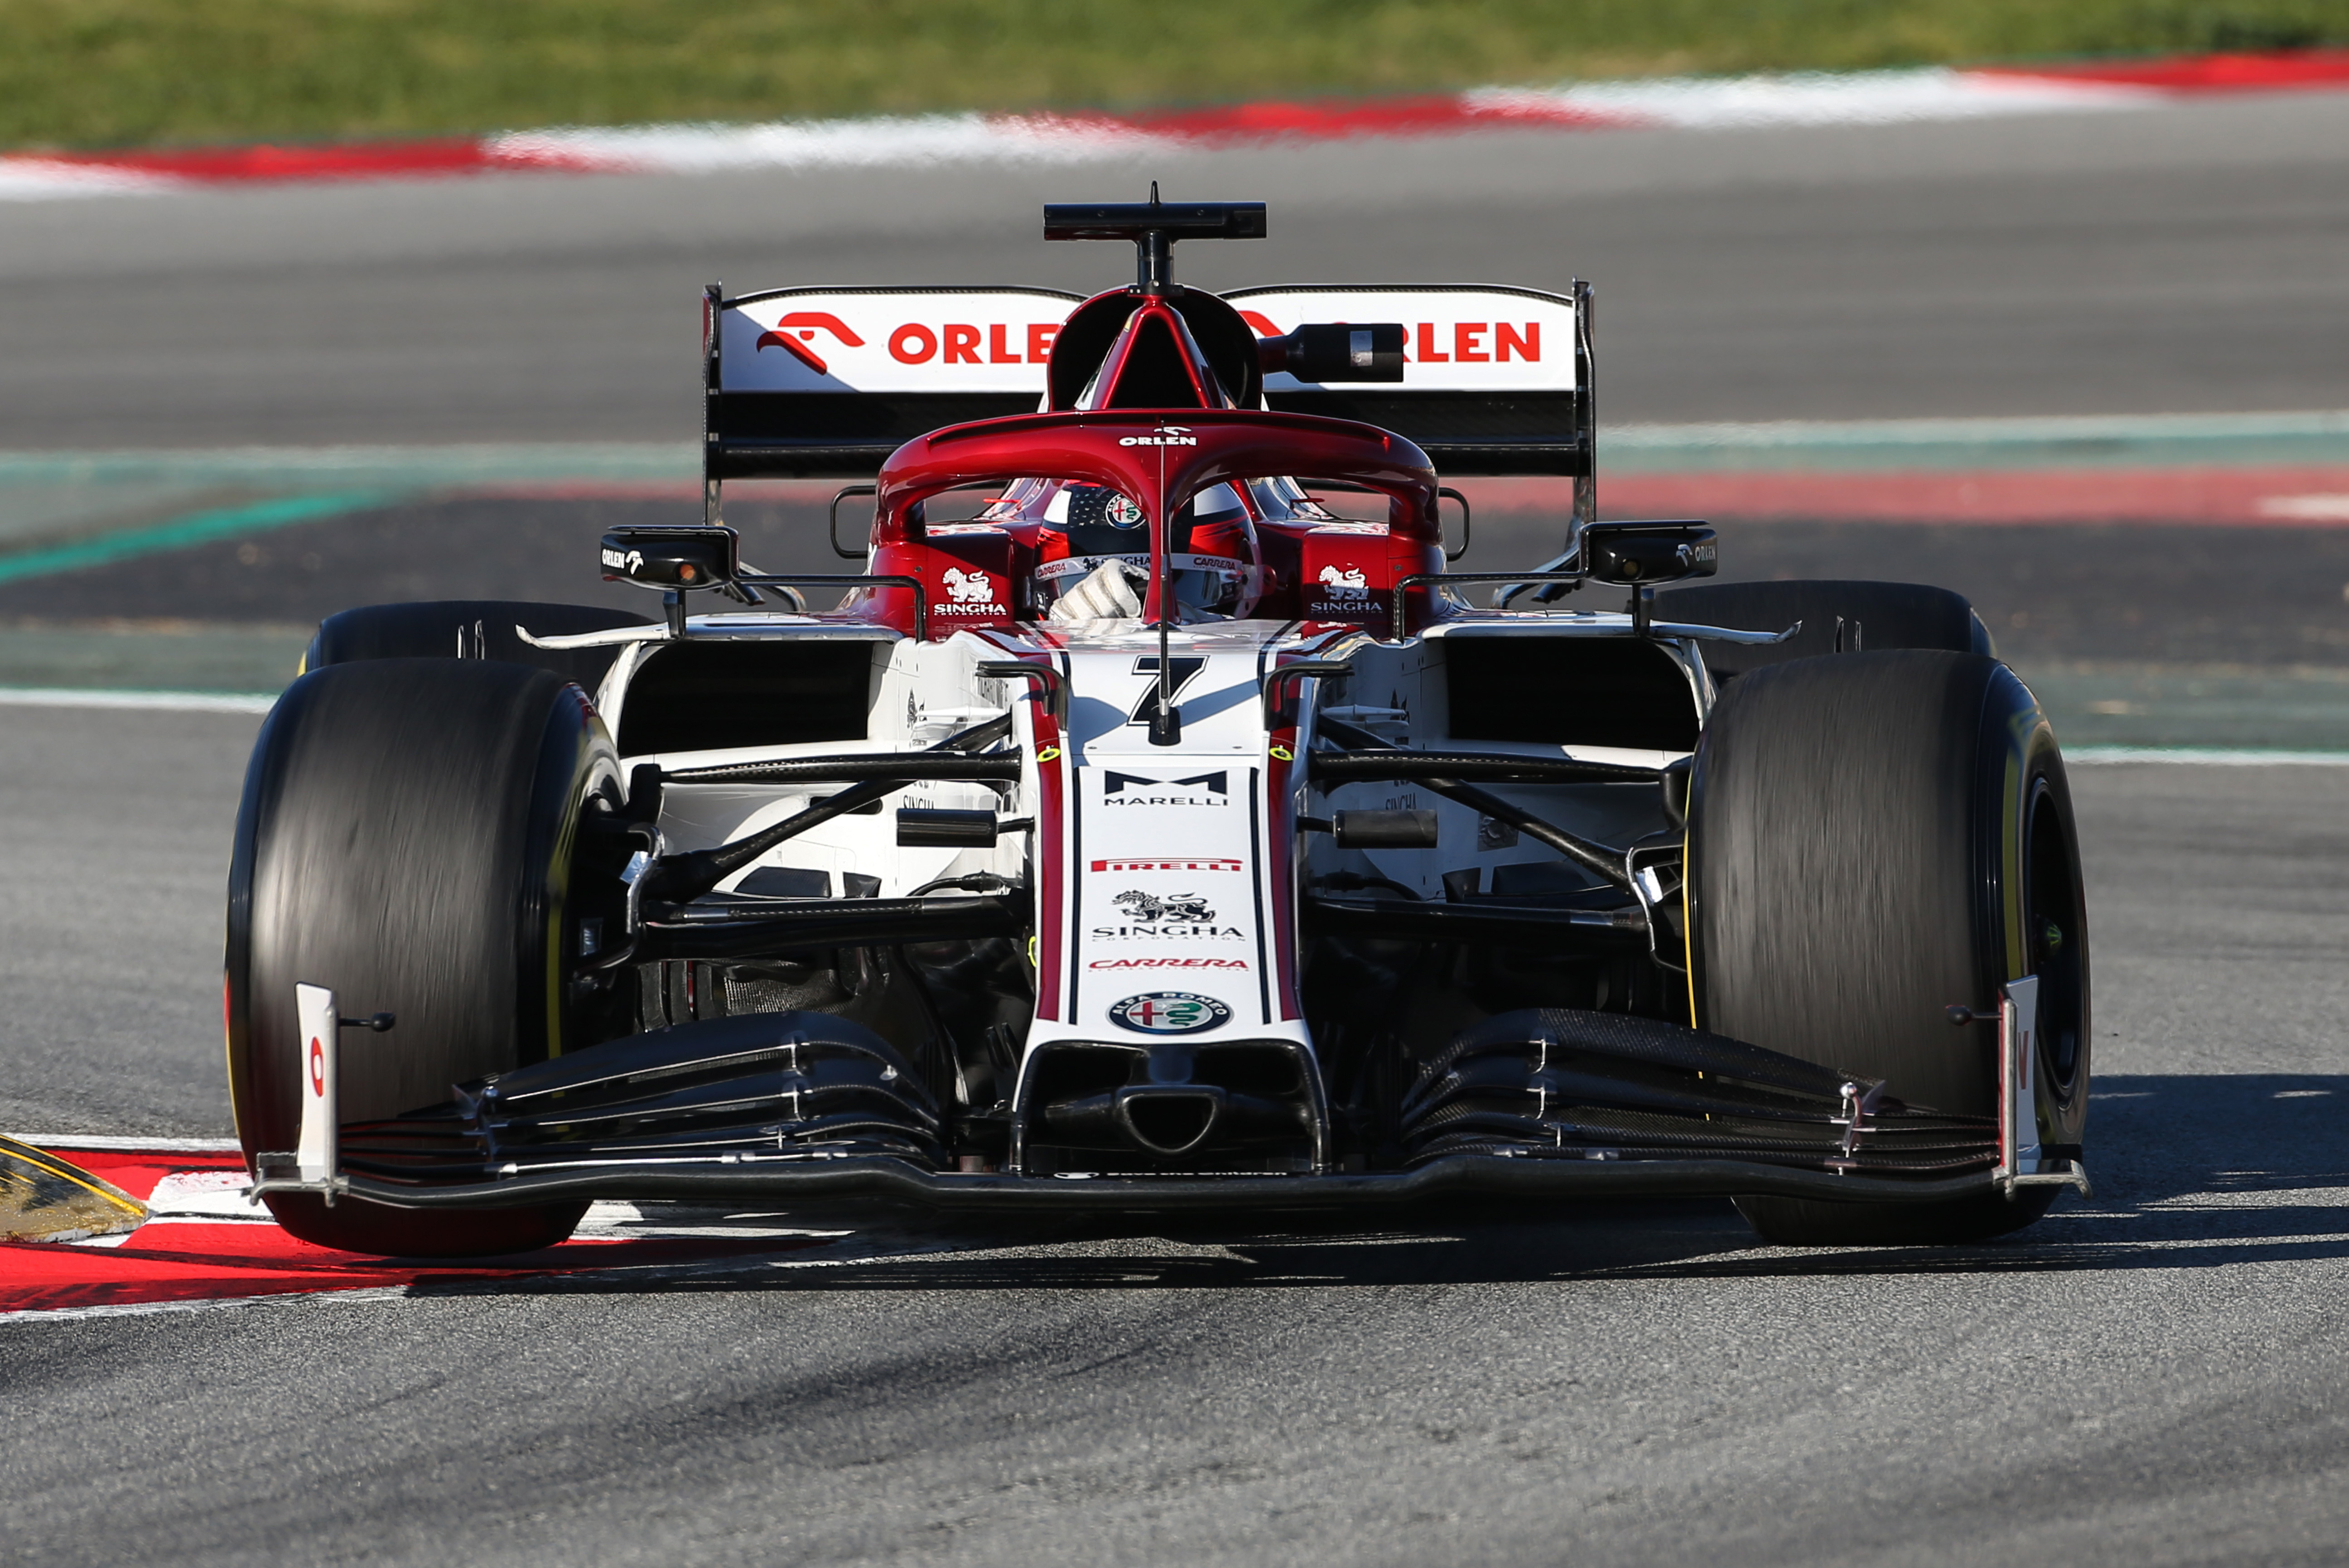 Motor Racing Formula One Testing Test Two Day 3 Barcelona, Spain